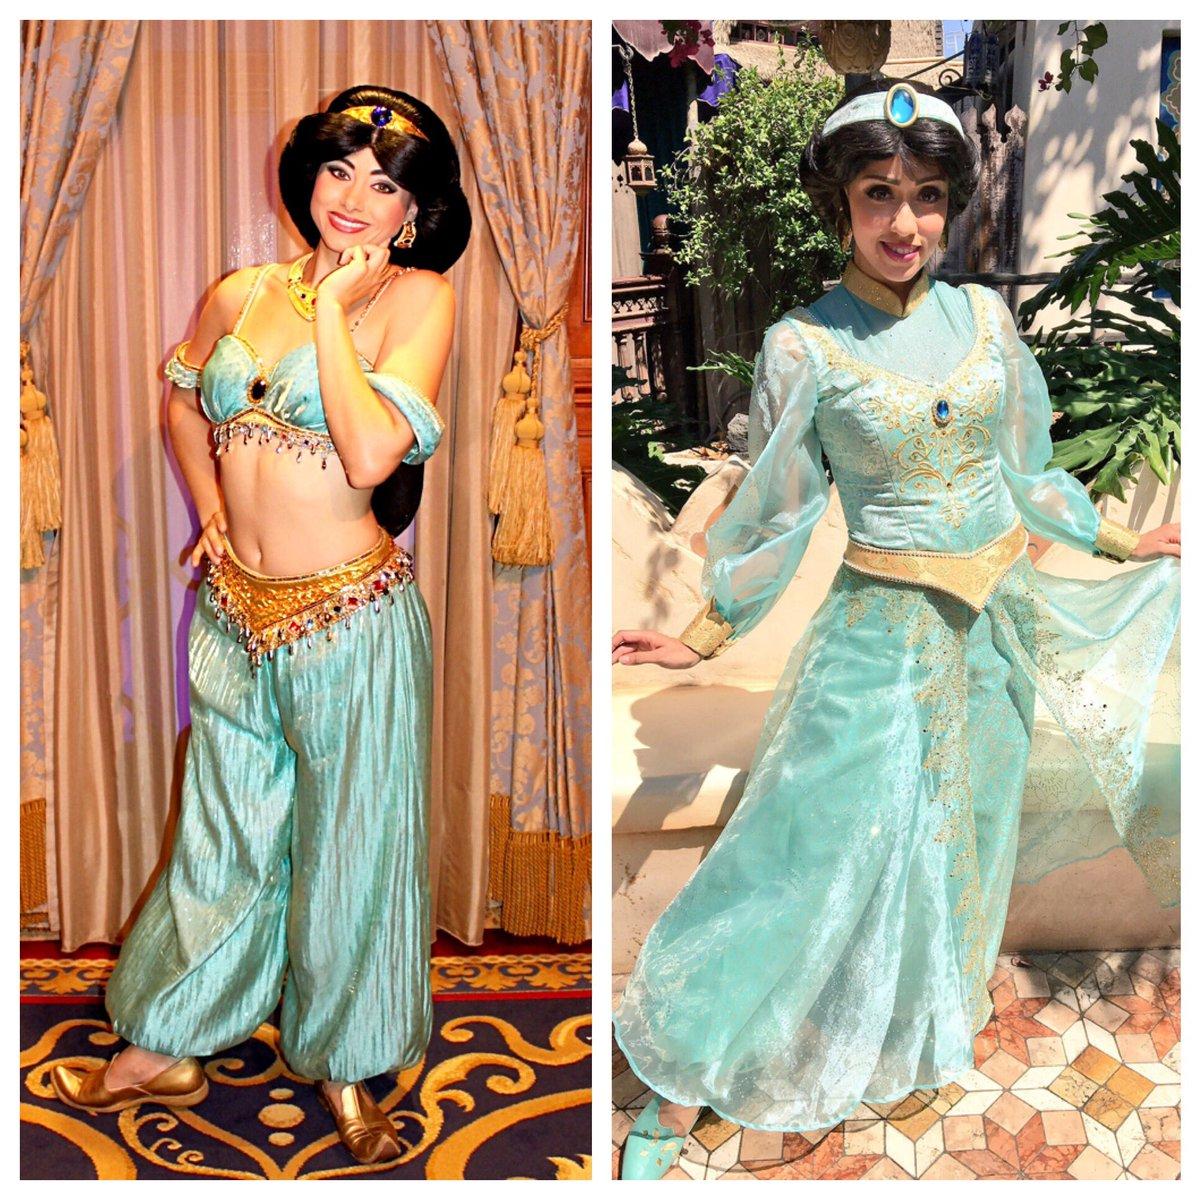 Jasmine Dress Princess Jasmine Dress Princess Dress Disney World Dress Disneyland Dress